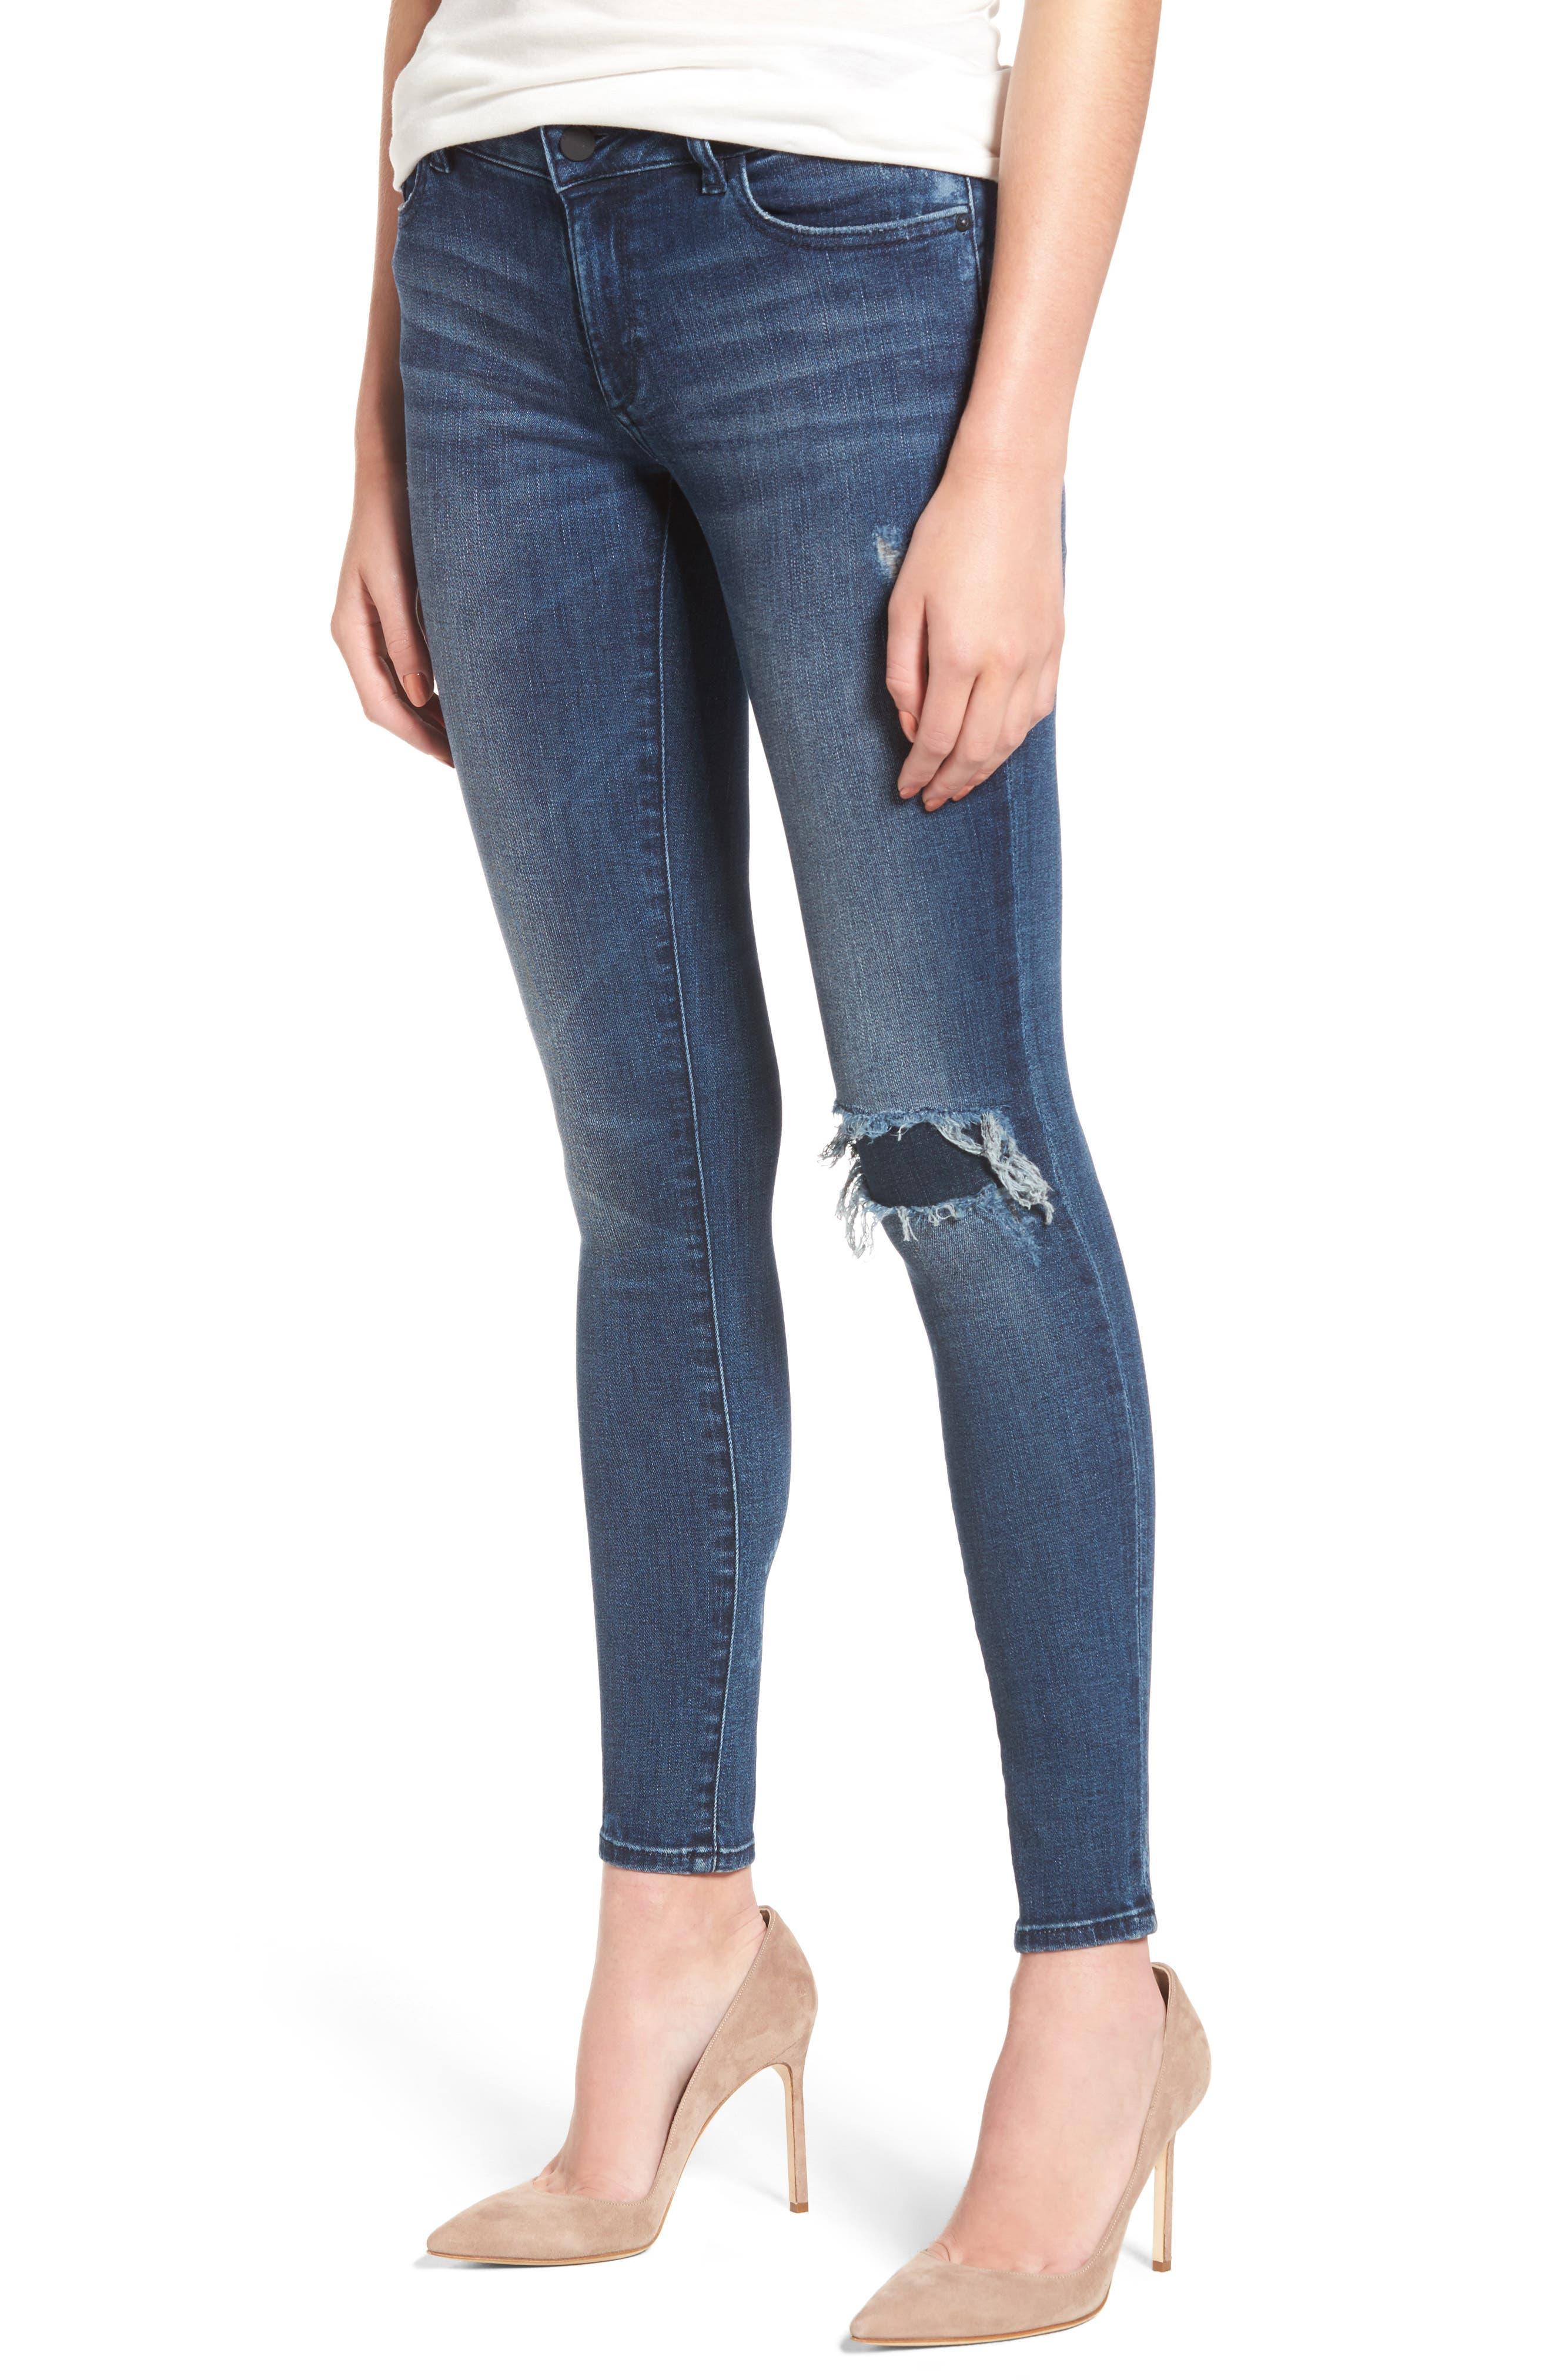 Main Image - DL1961 Emma Ripped Power Legging Jeans (Dragoon)